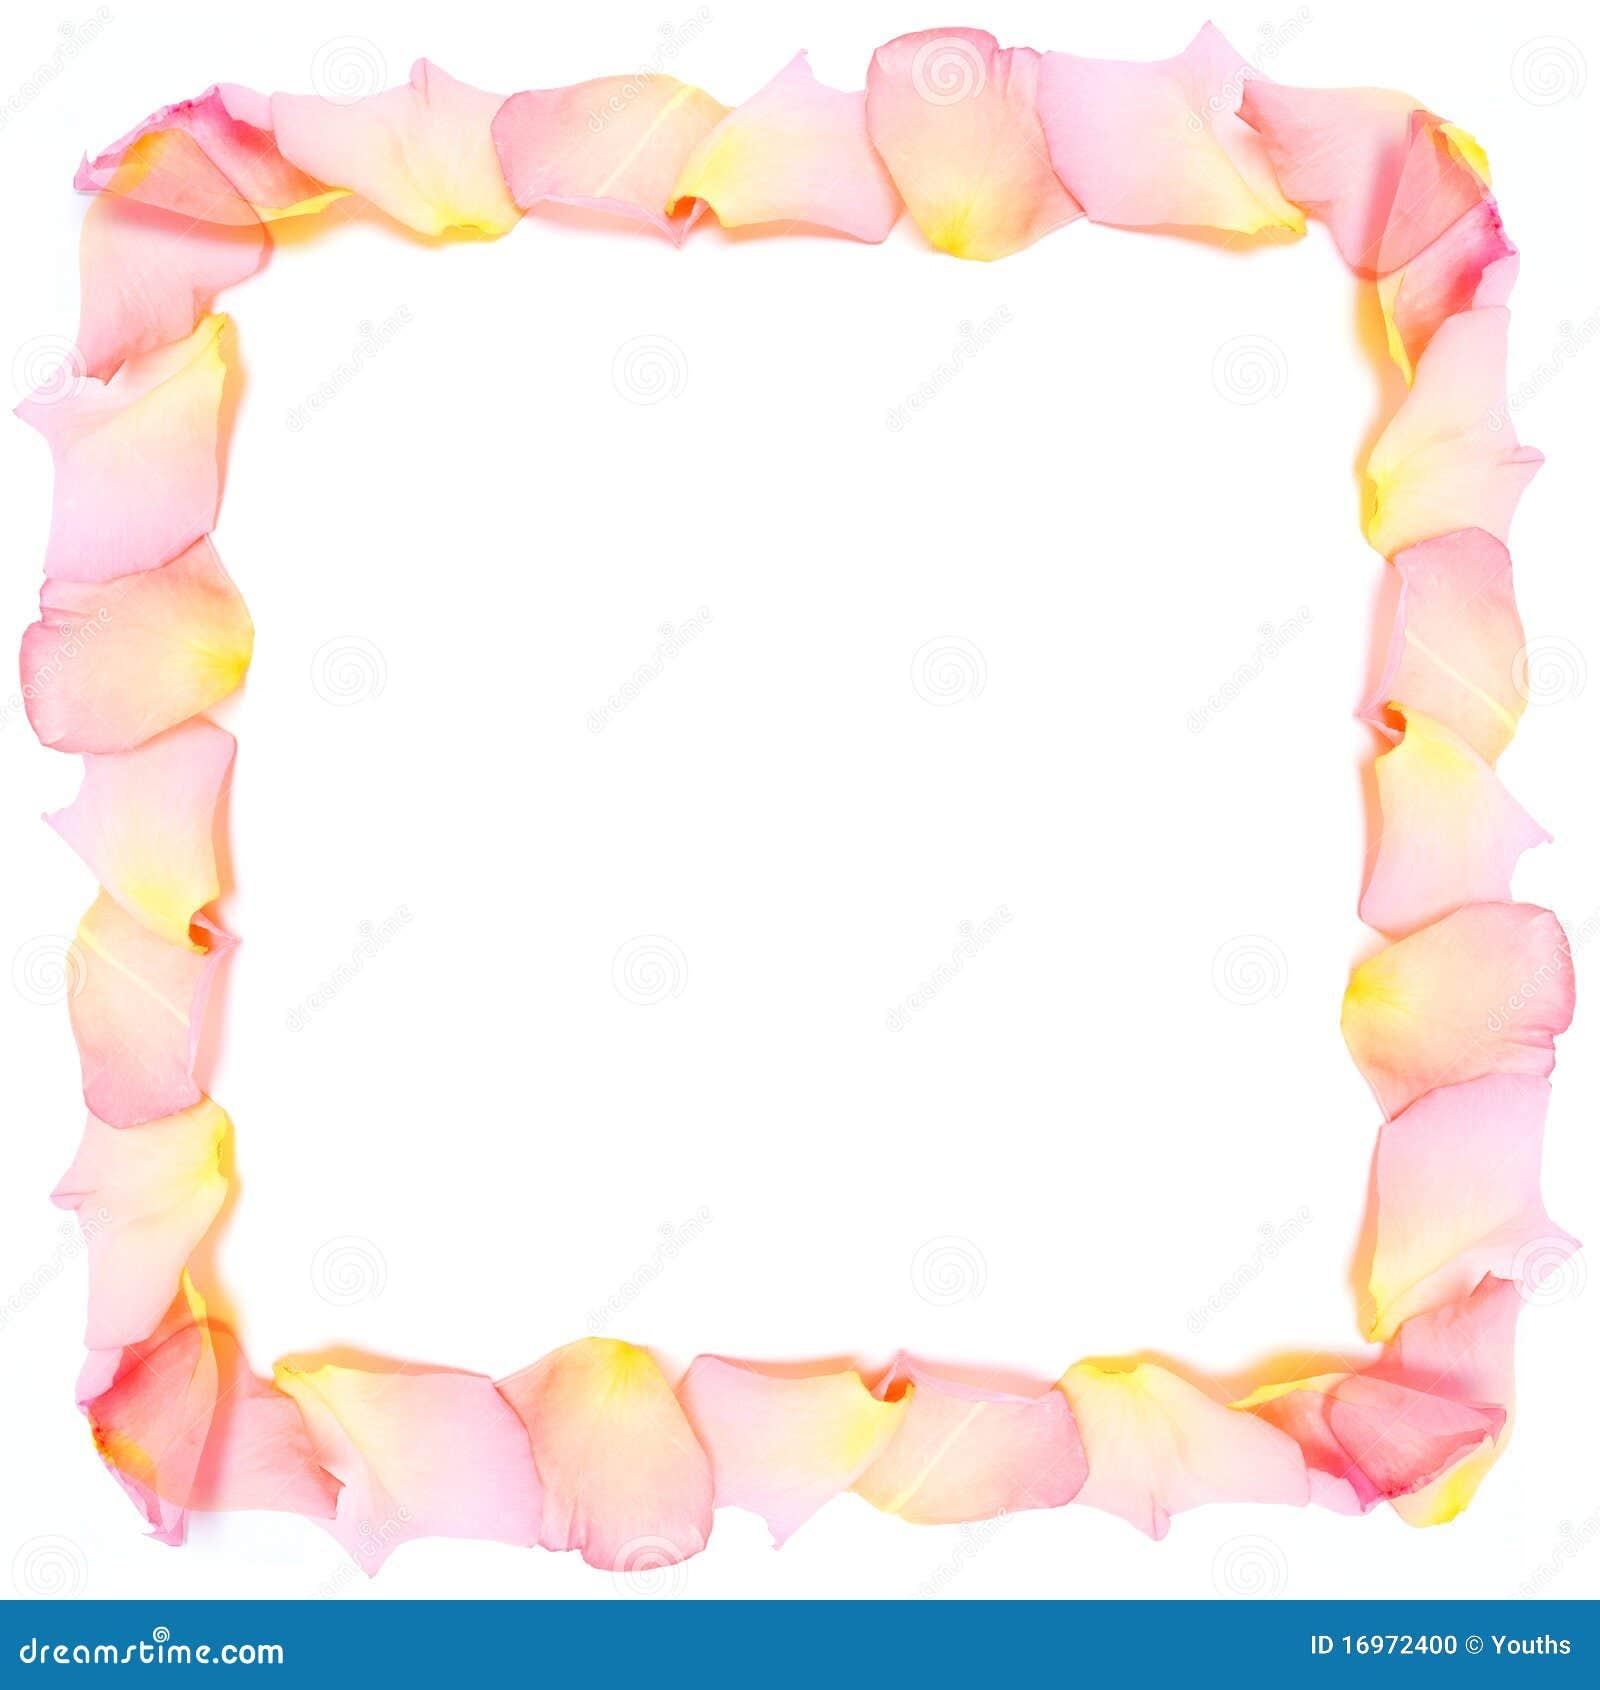 gold frame rose petals - photo #40